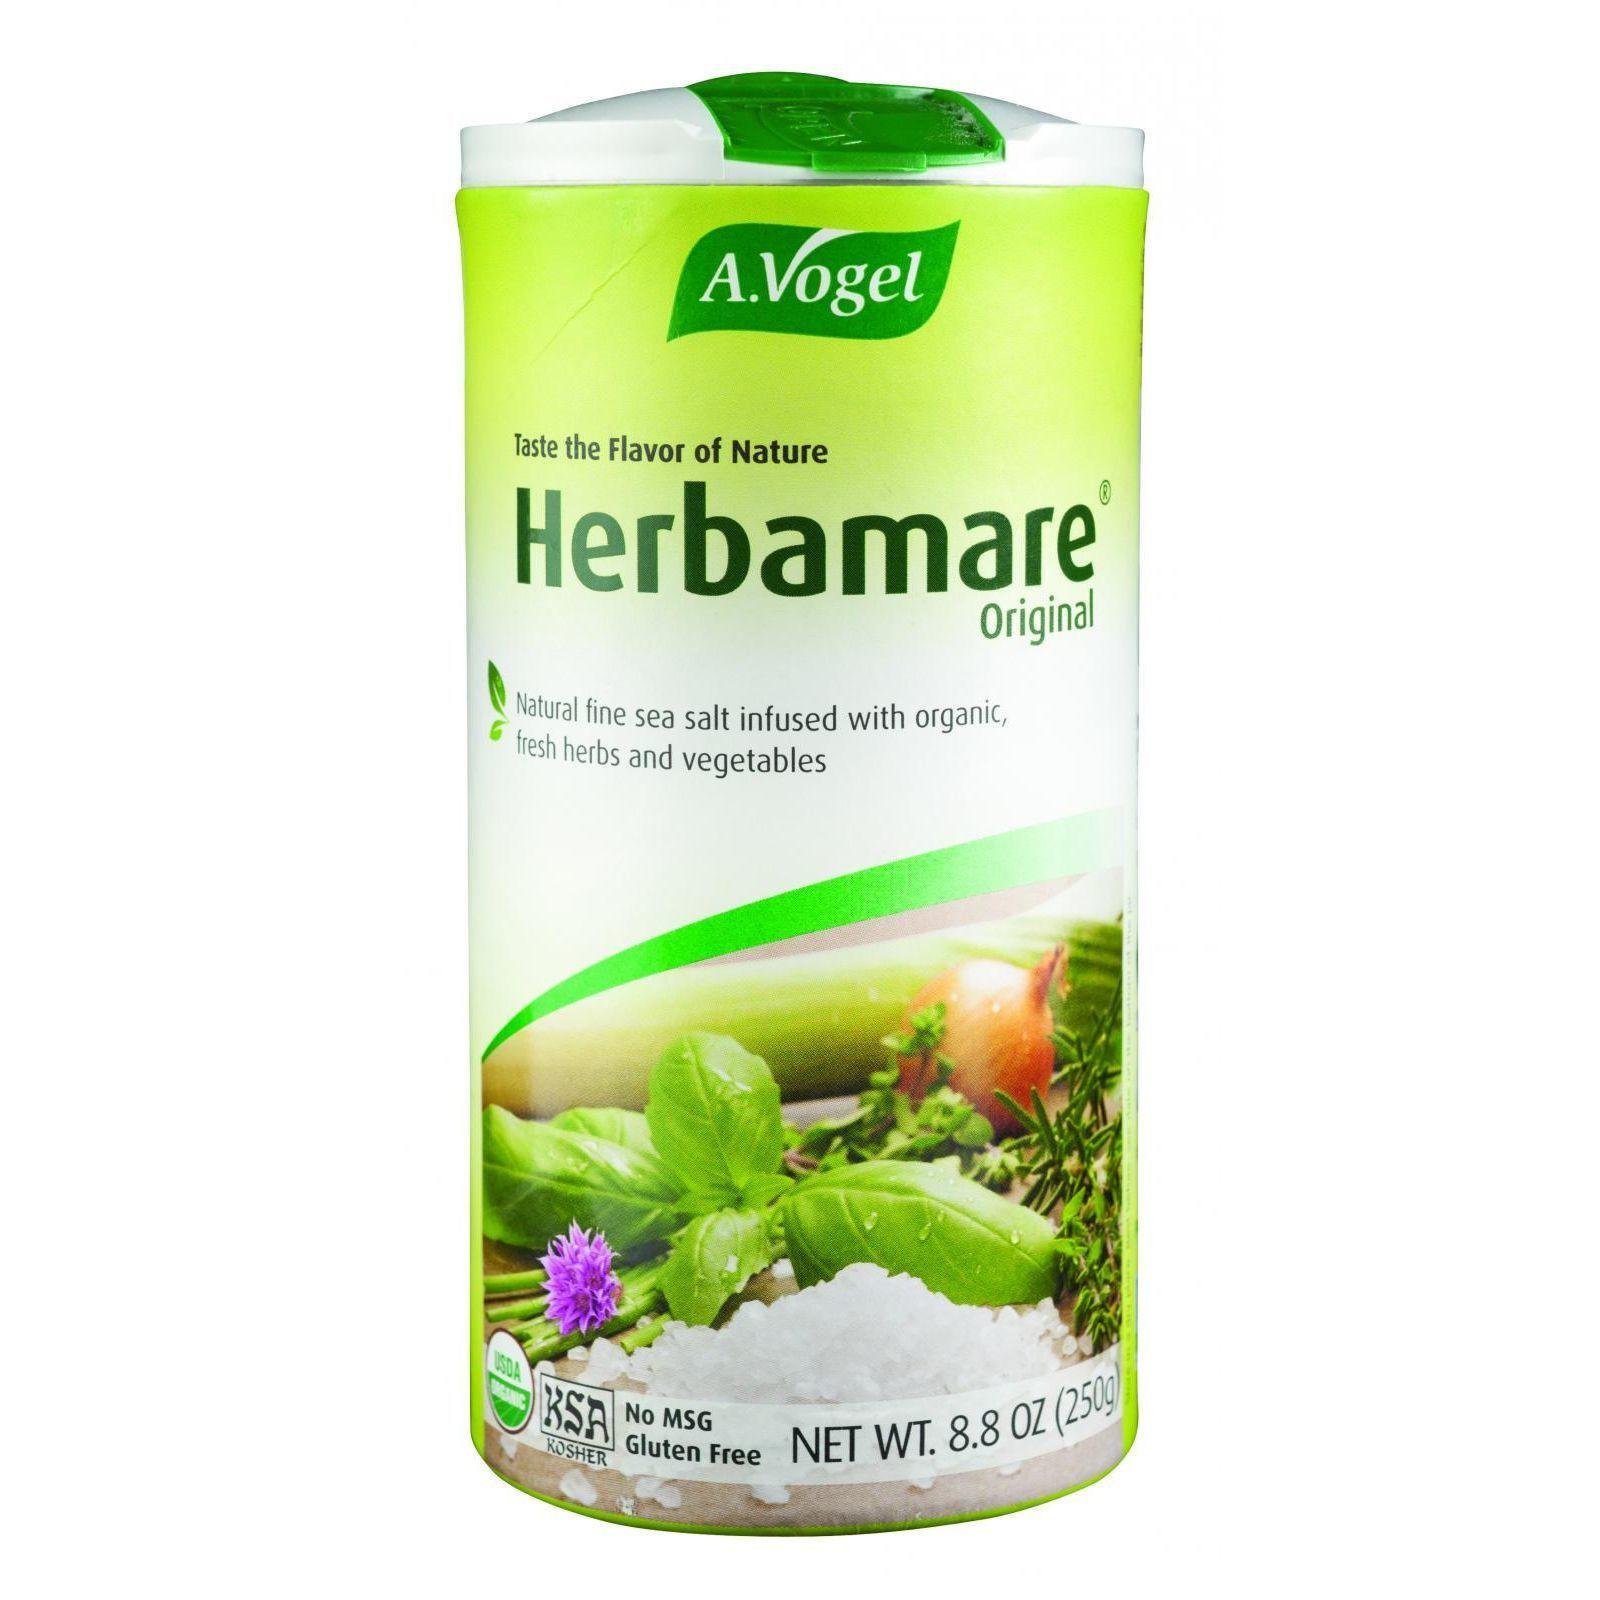 A Vogel Organic Herbamare Seasoning - Original - 8.8 oz